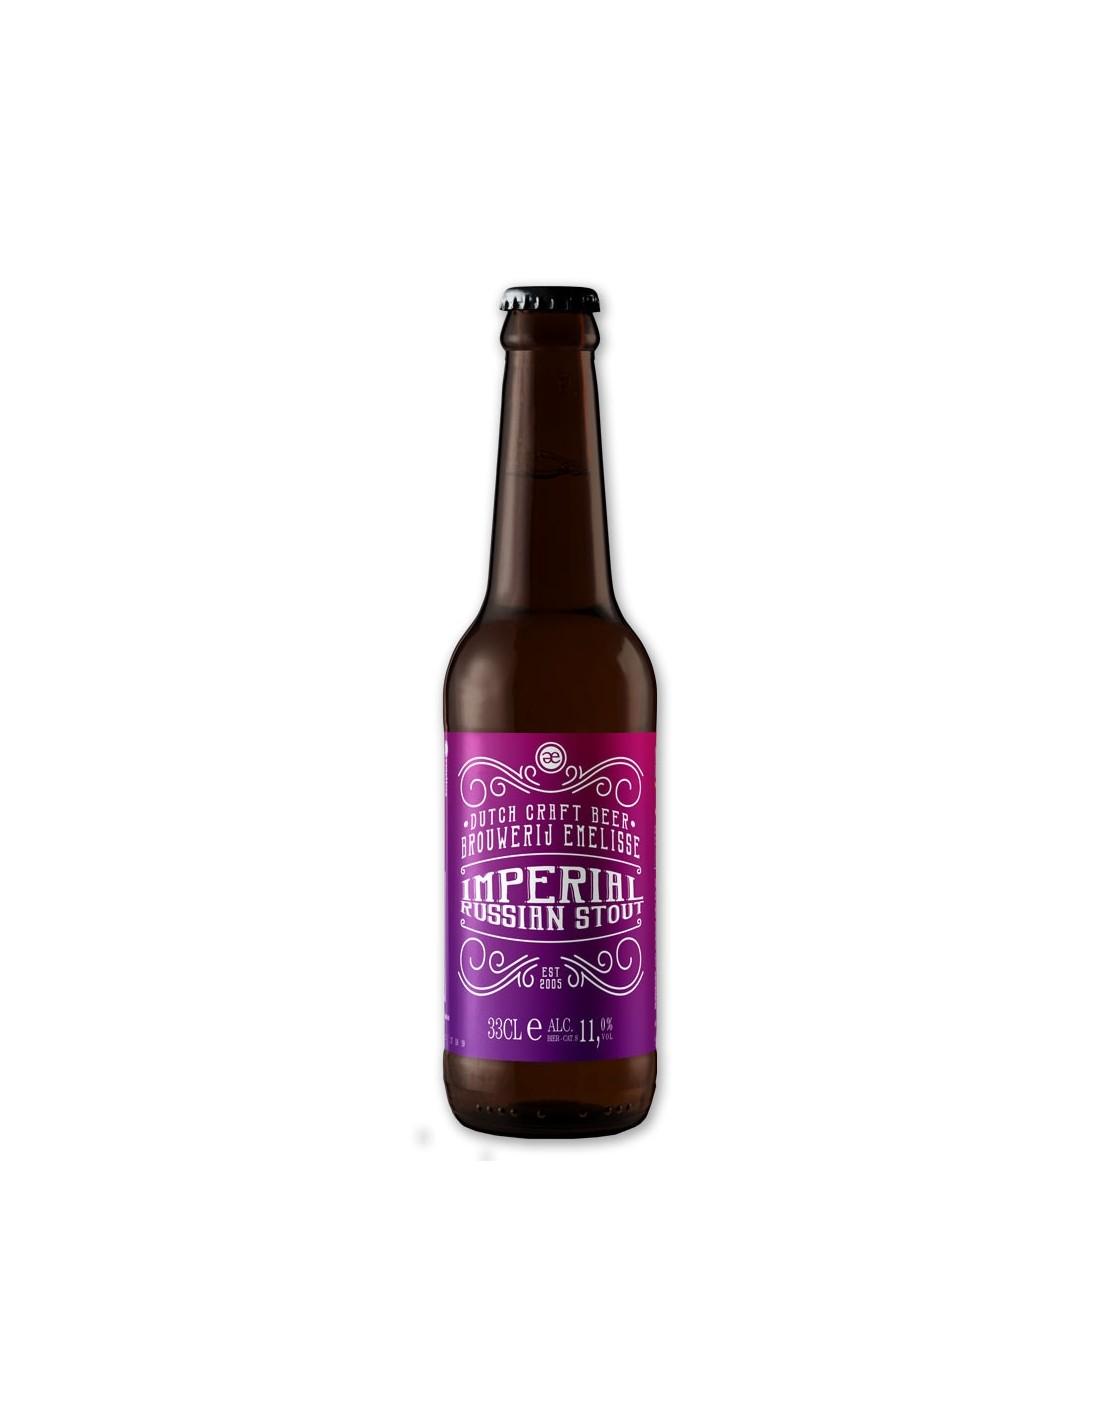 Bere artizanala Brouwerij Emelisse ImperiaL, 11% alc., 0.33L, Rusia